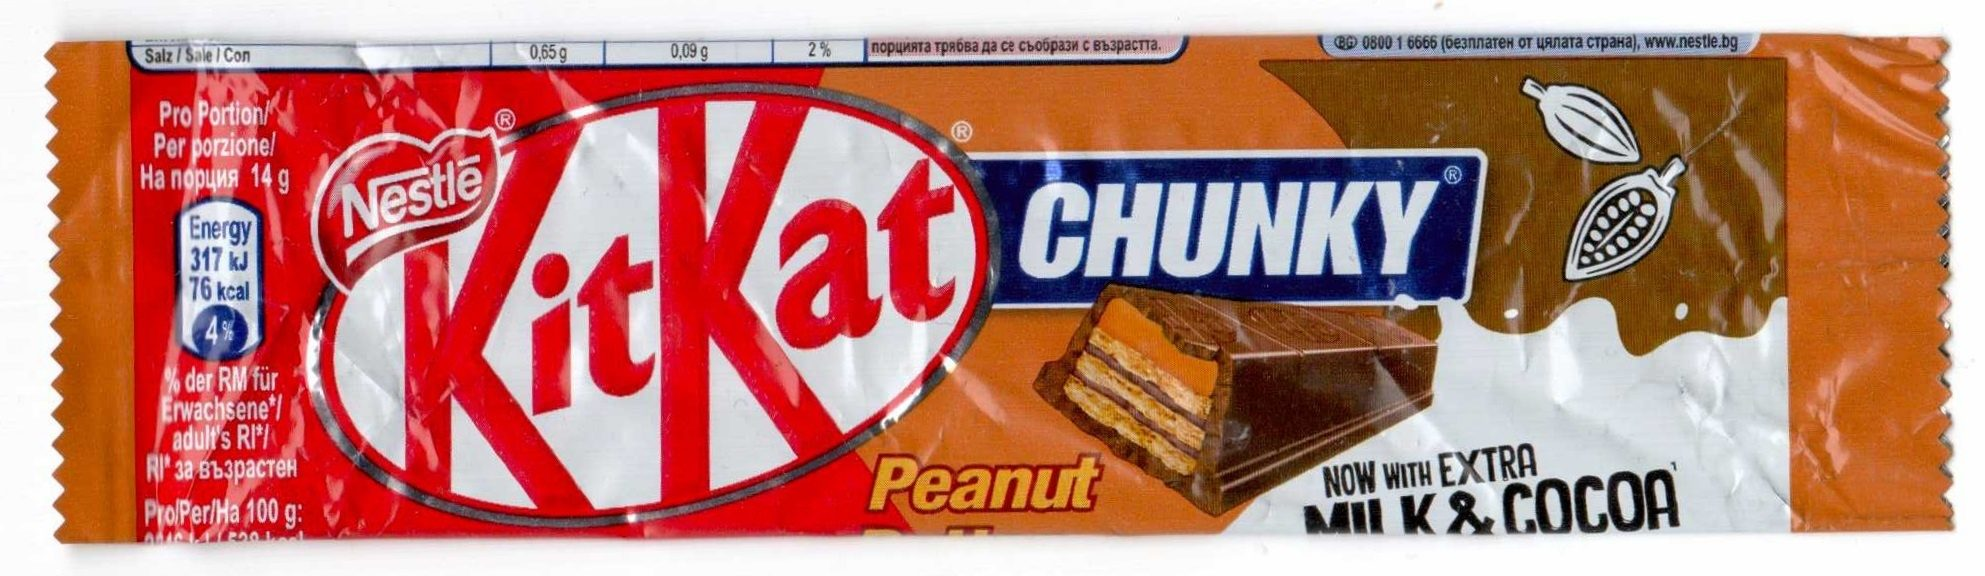 Kit Kat Chunky Peanut Butter Nestle 42g